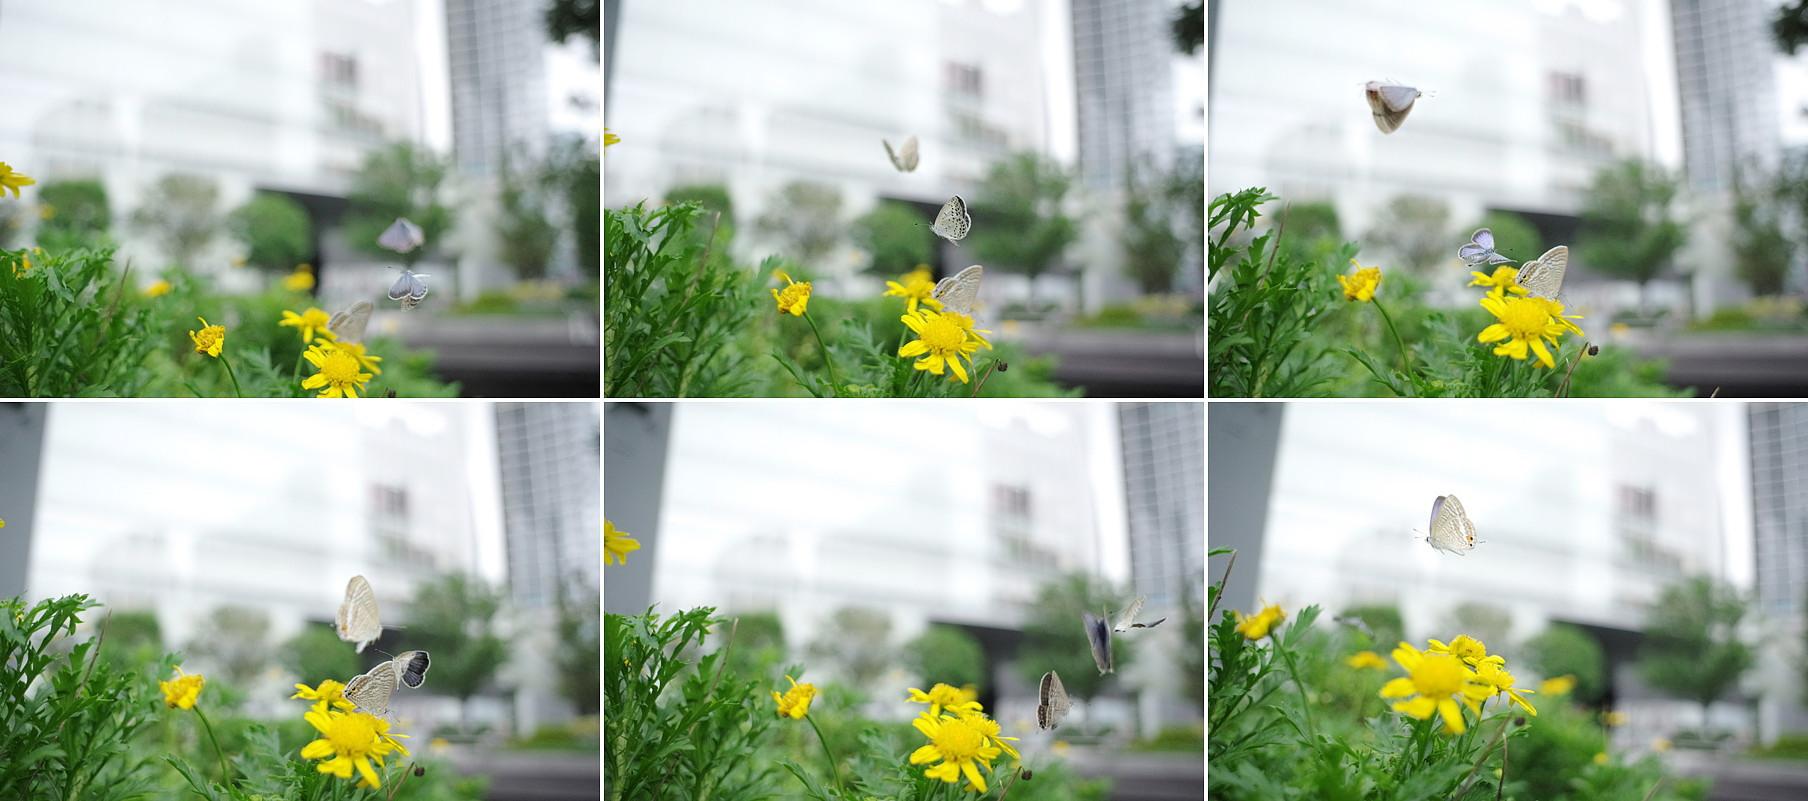 a0181059_201205.jpg